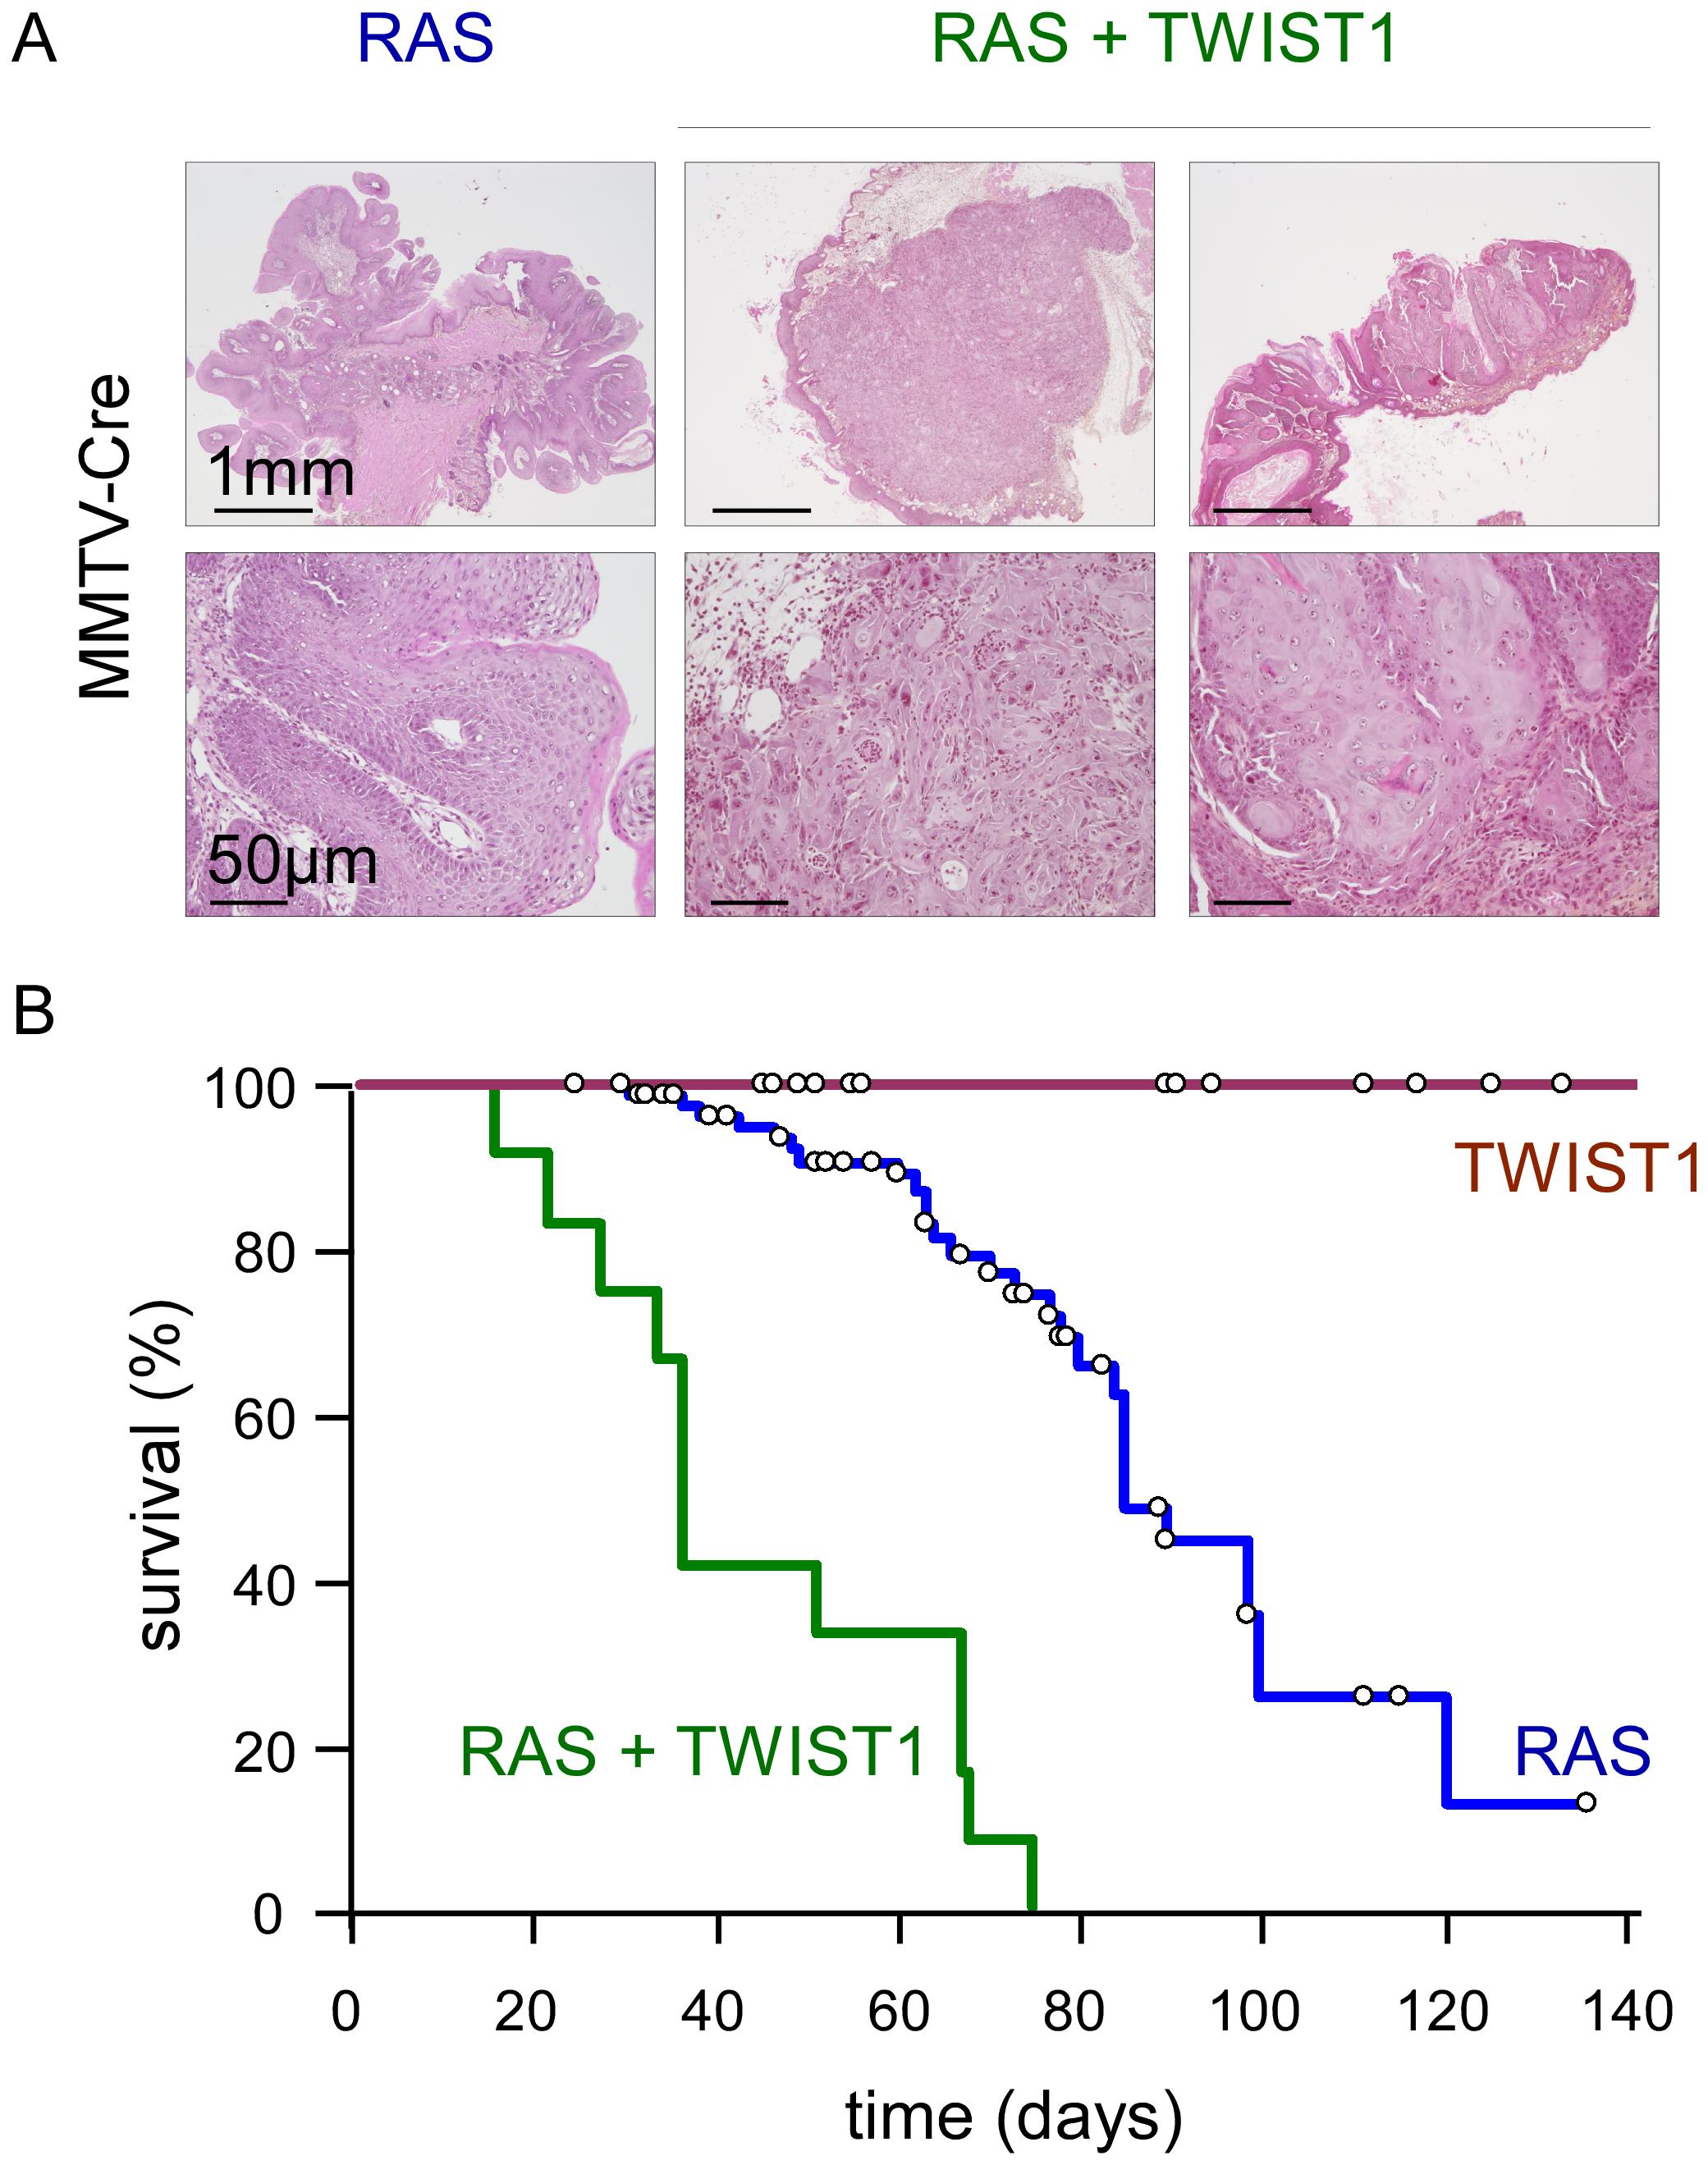 Twist1 promotes tumor progression <i>in vivo</i>.